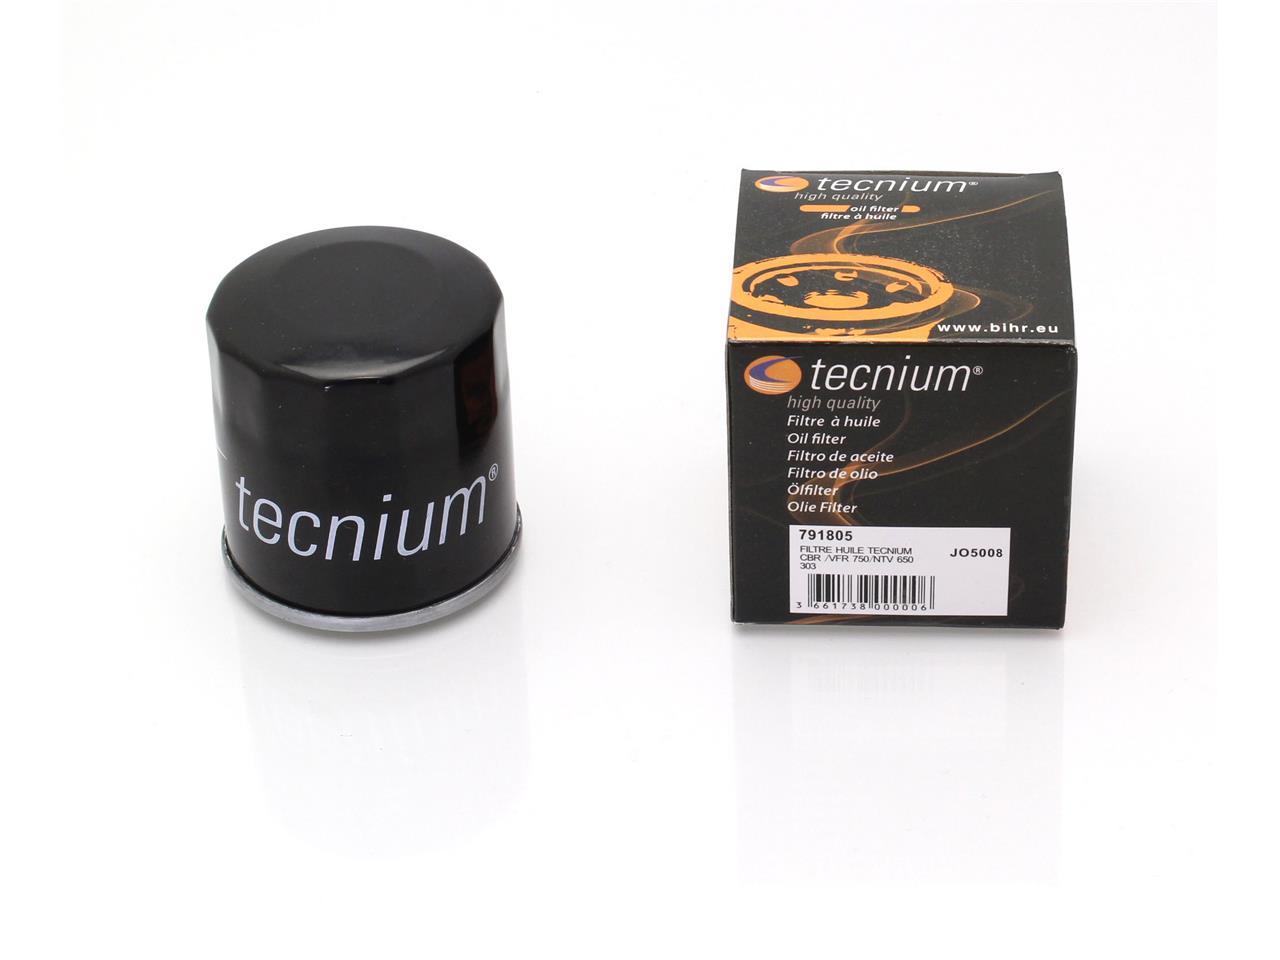 TECNIUM テクニウム【アウトレットセール対象商品】TECNIUM タイプ303 オイル フィルター(Tecnium Type 303 Oil Filter【ヨーロッパ直輸入品】)【特価商品】